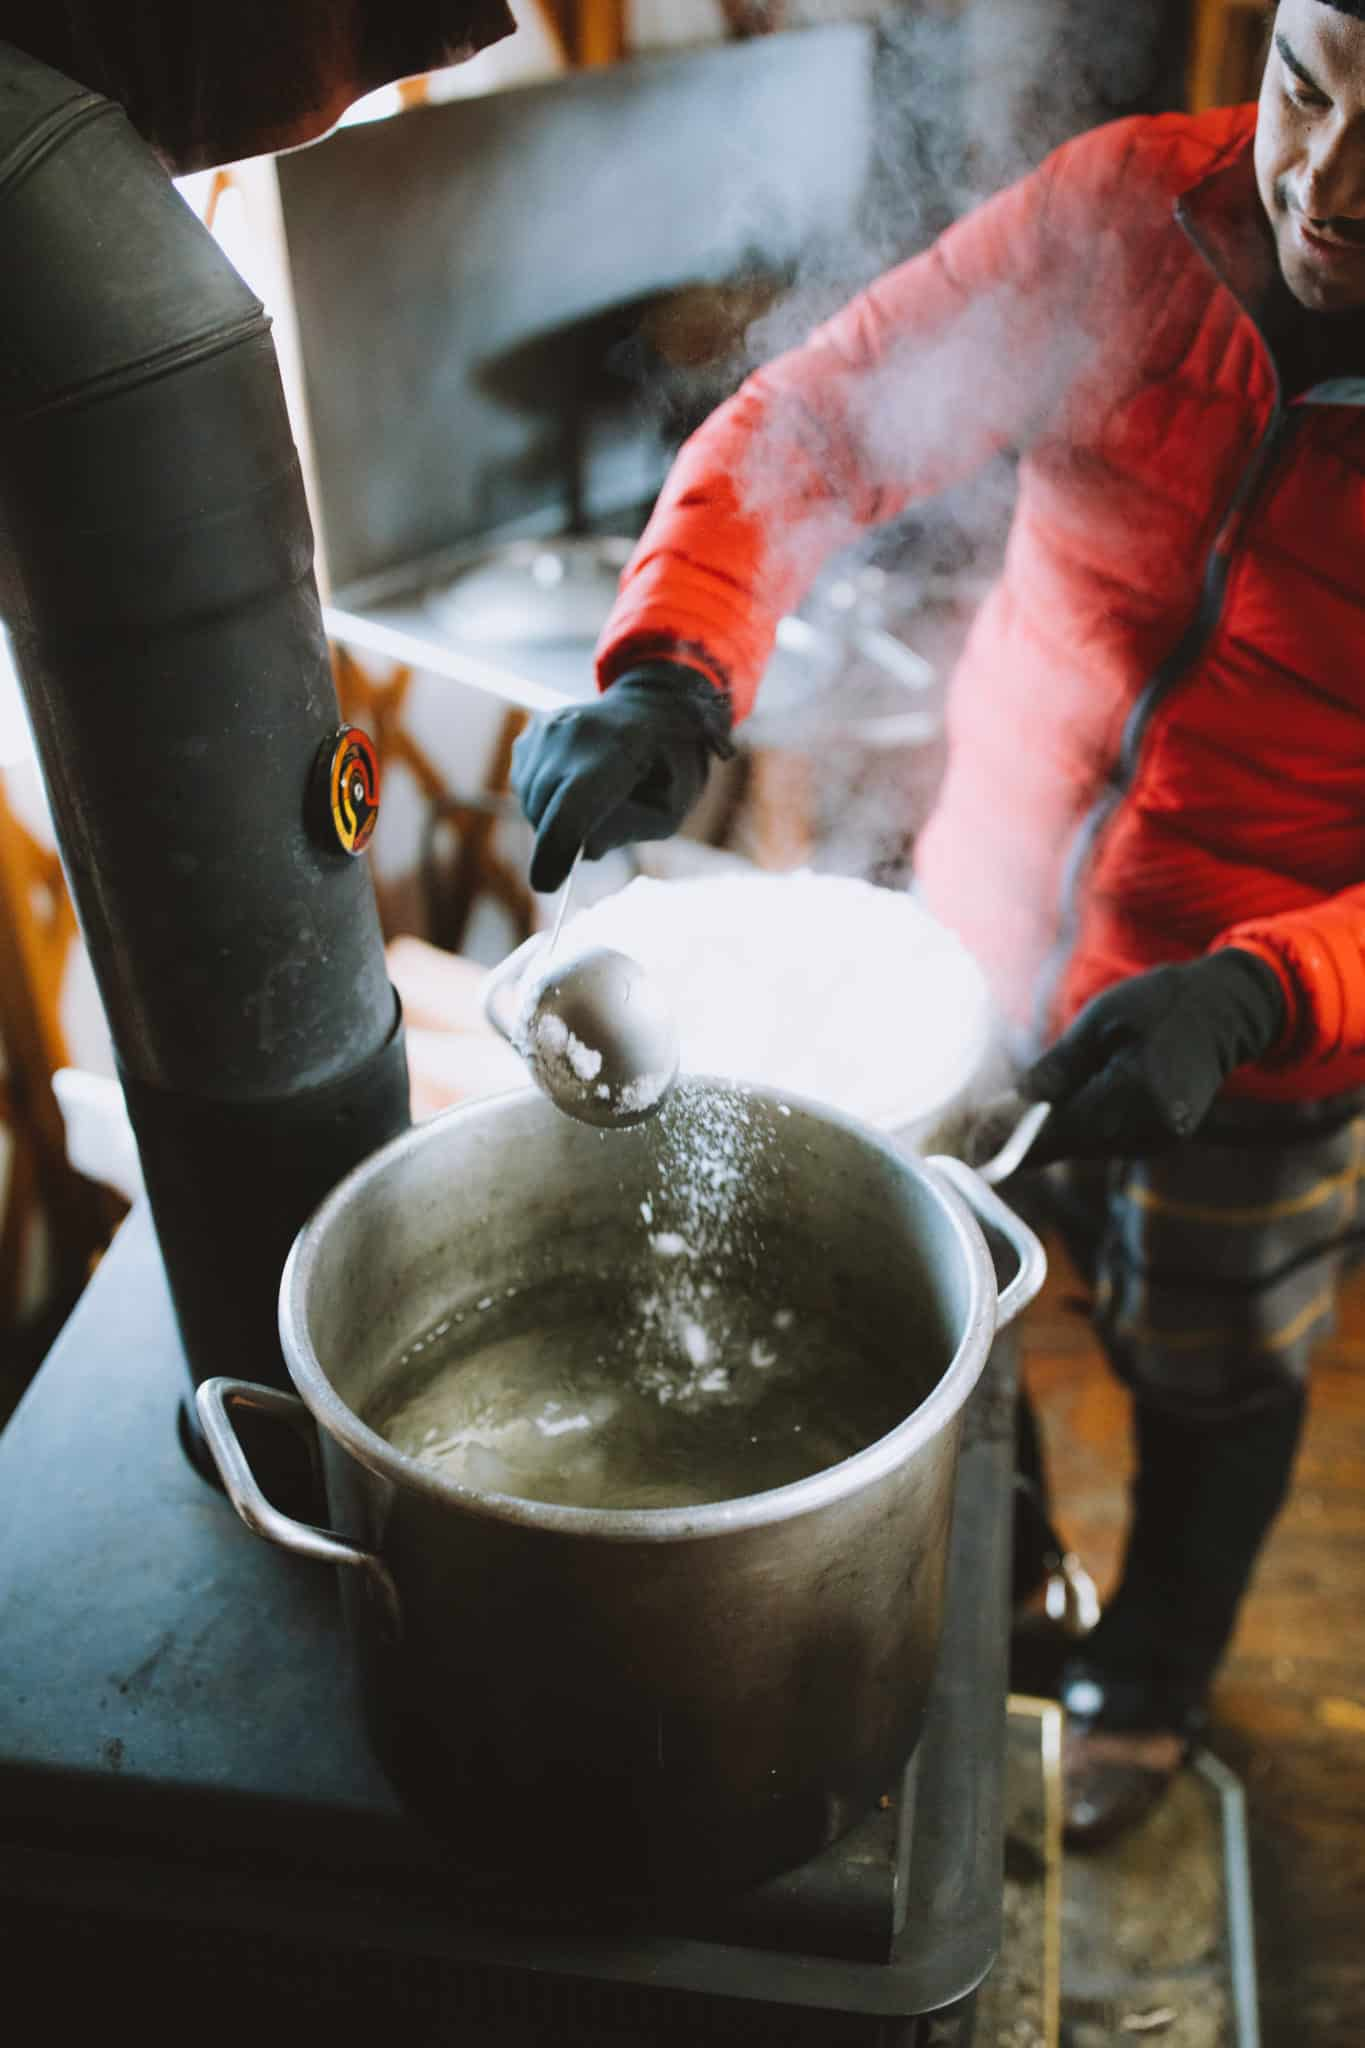 Berty Mandagie melting snow on stove